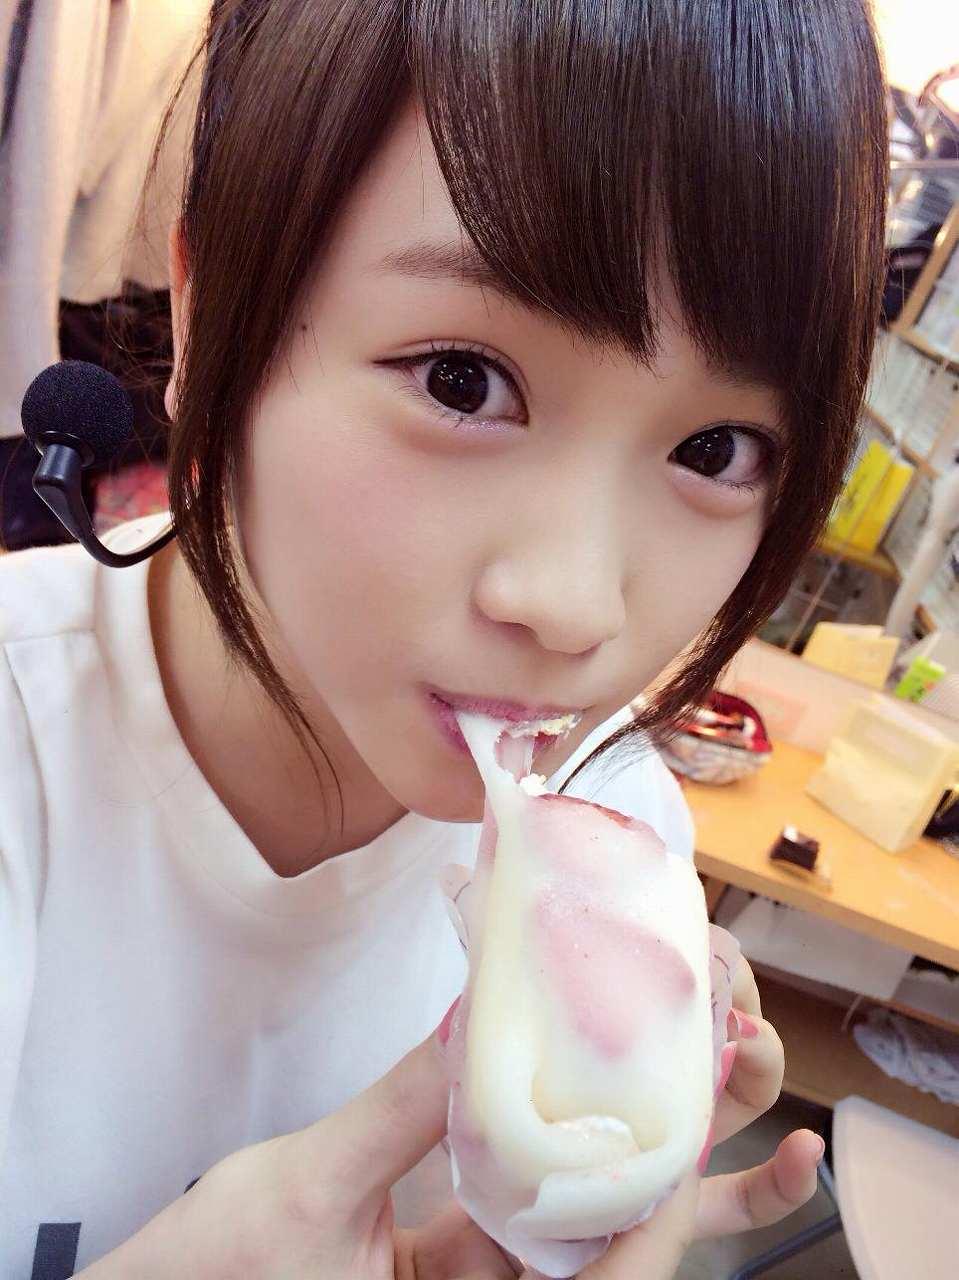 AKB48・川栄李奈の疑似フェラ(口内発射)画像